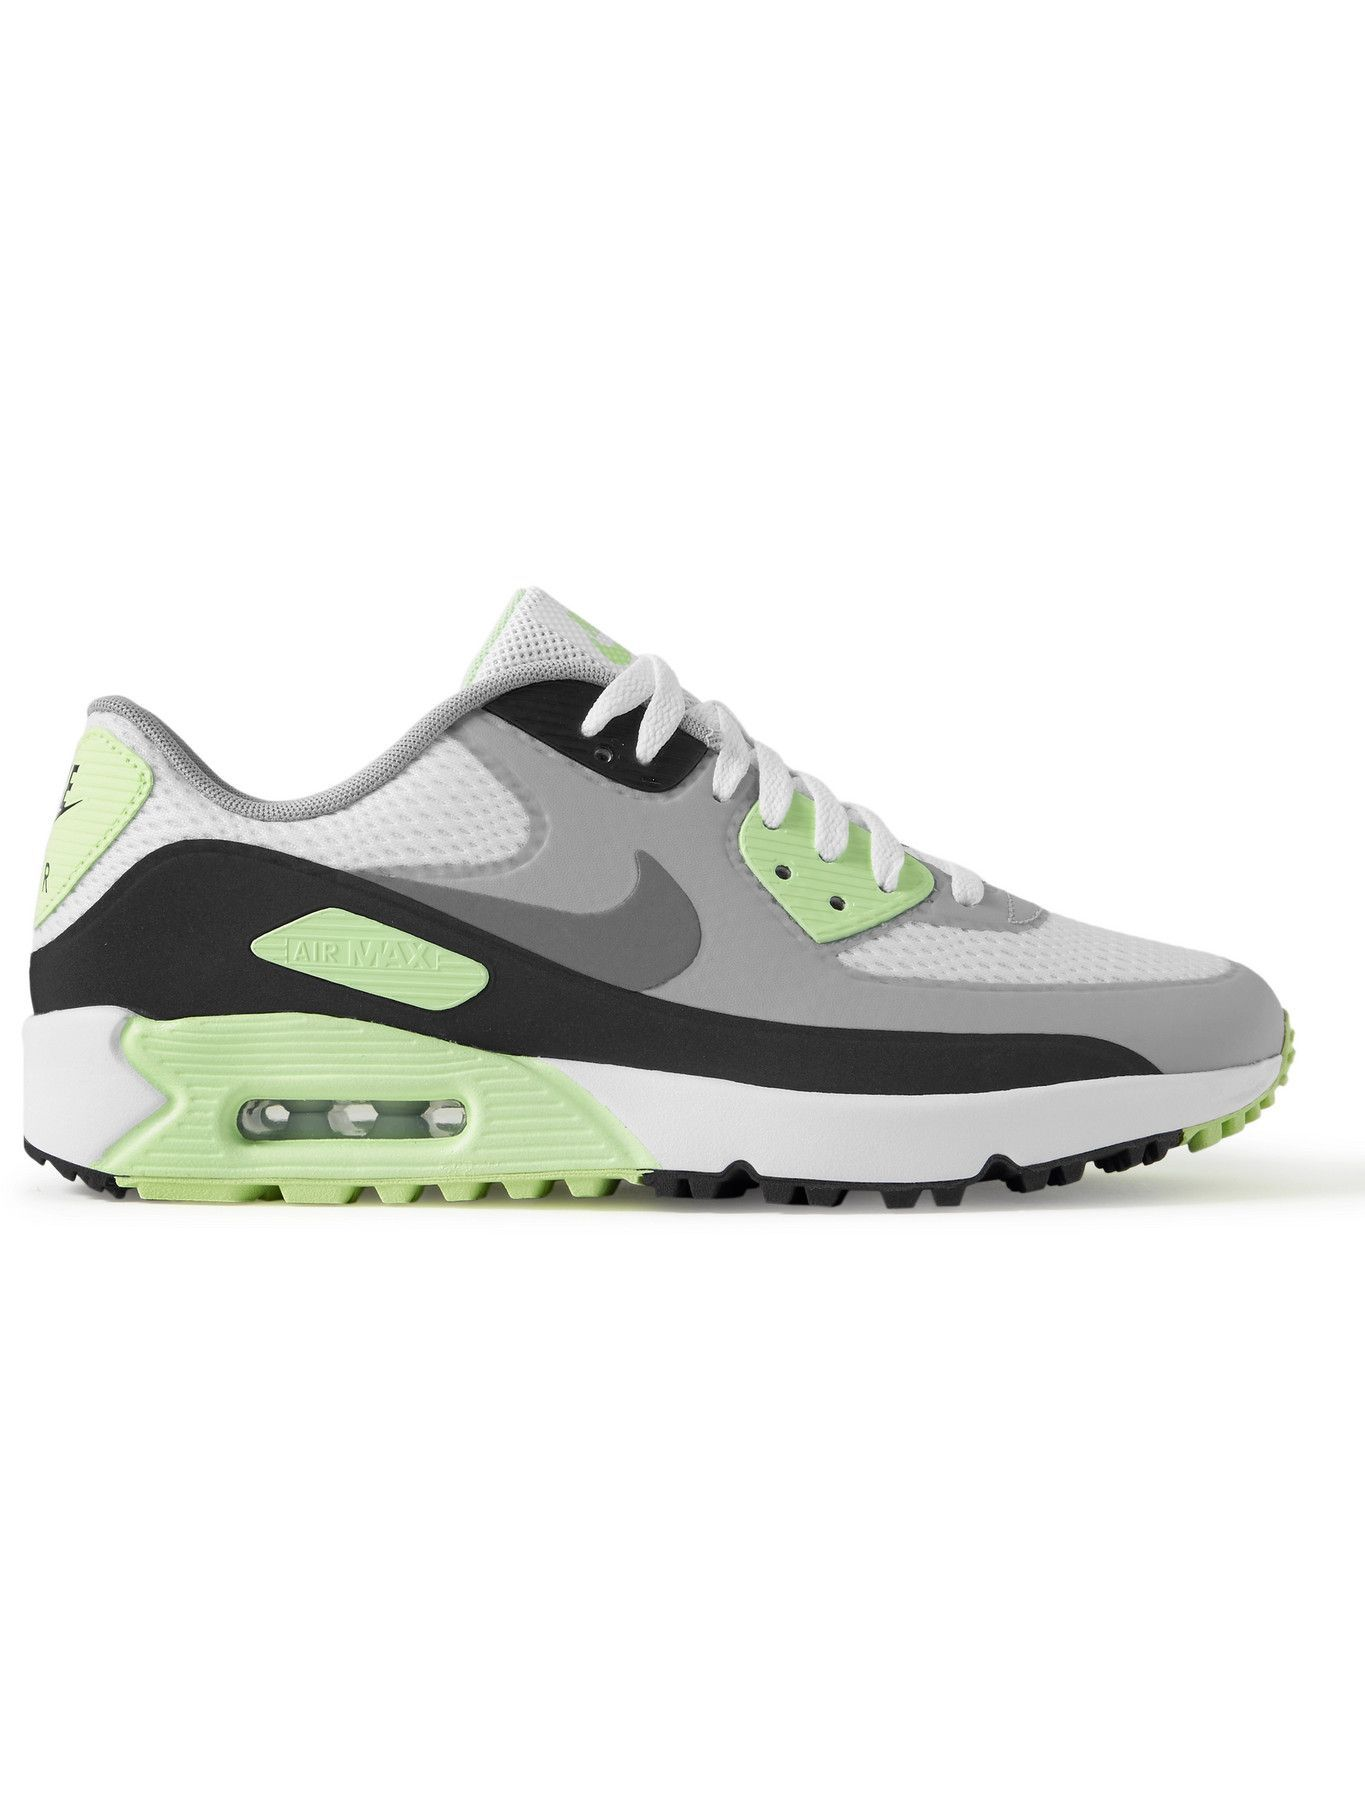 Photo: Nike Golf - Air Max 90 G Coated-Mesh Golf Shoes - White